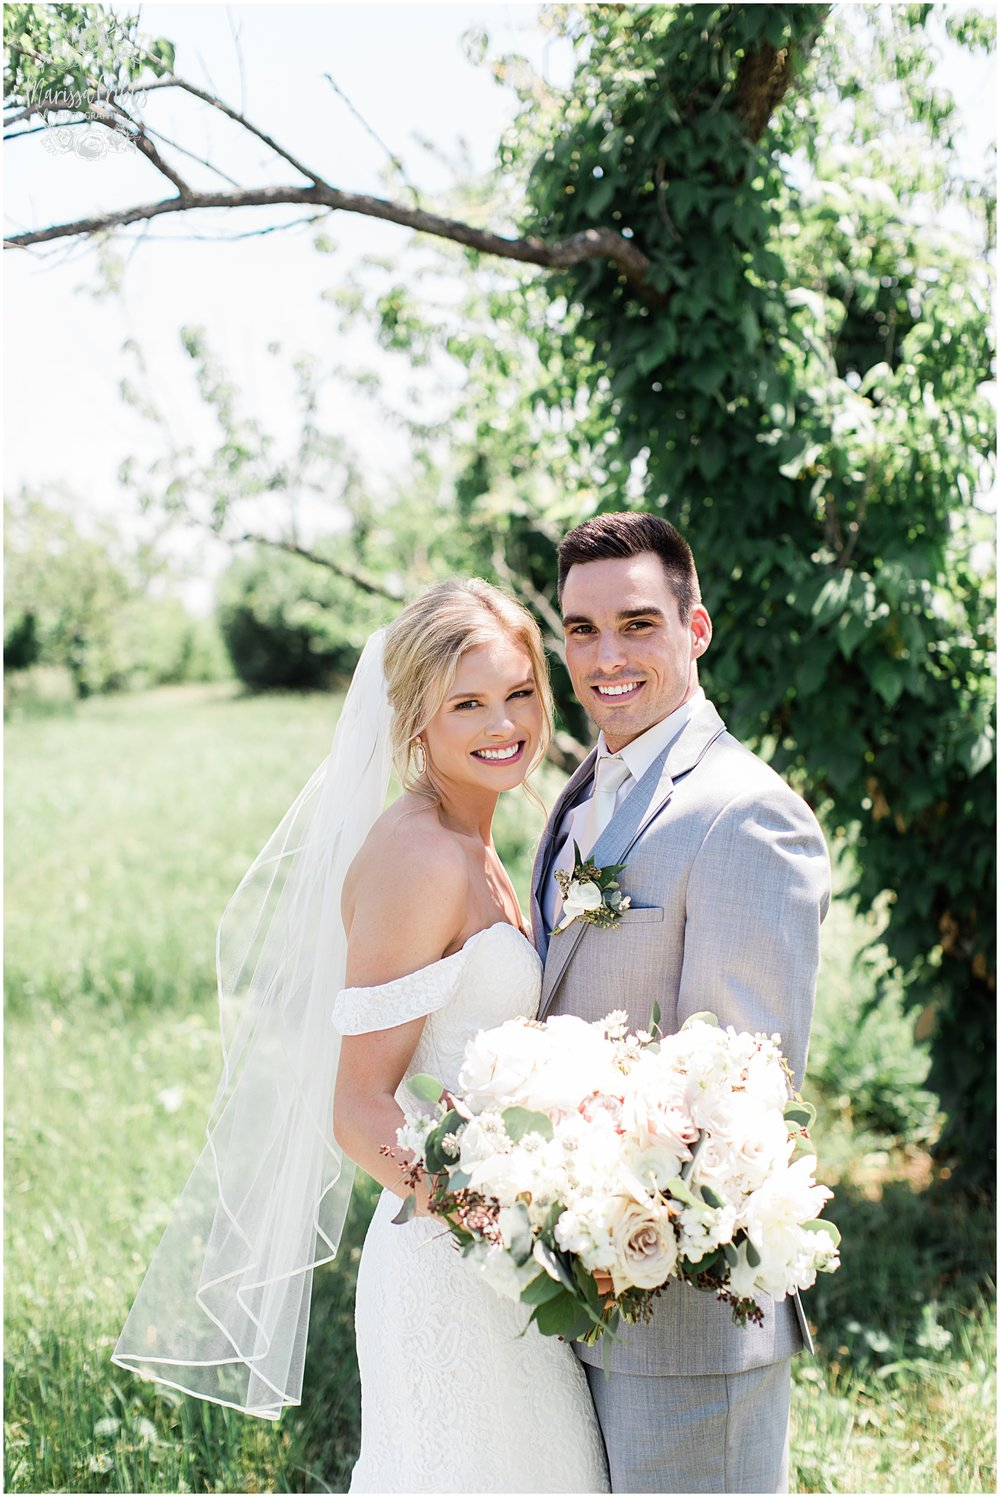 RHODES WEDDING | WESTON RED BARN FARM | MARISSA CRIBBS PHOTOGRAPHY_5229.jpg